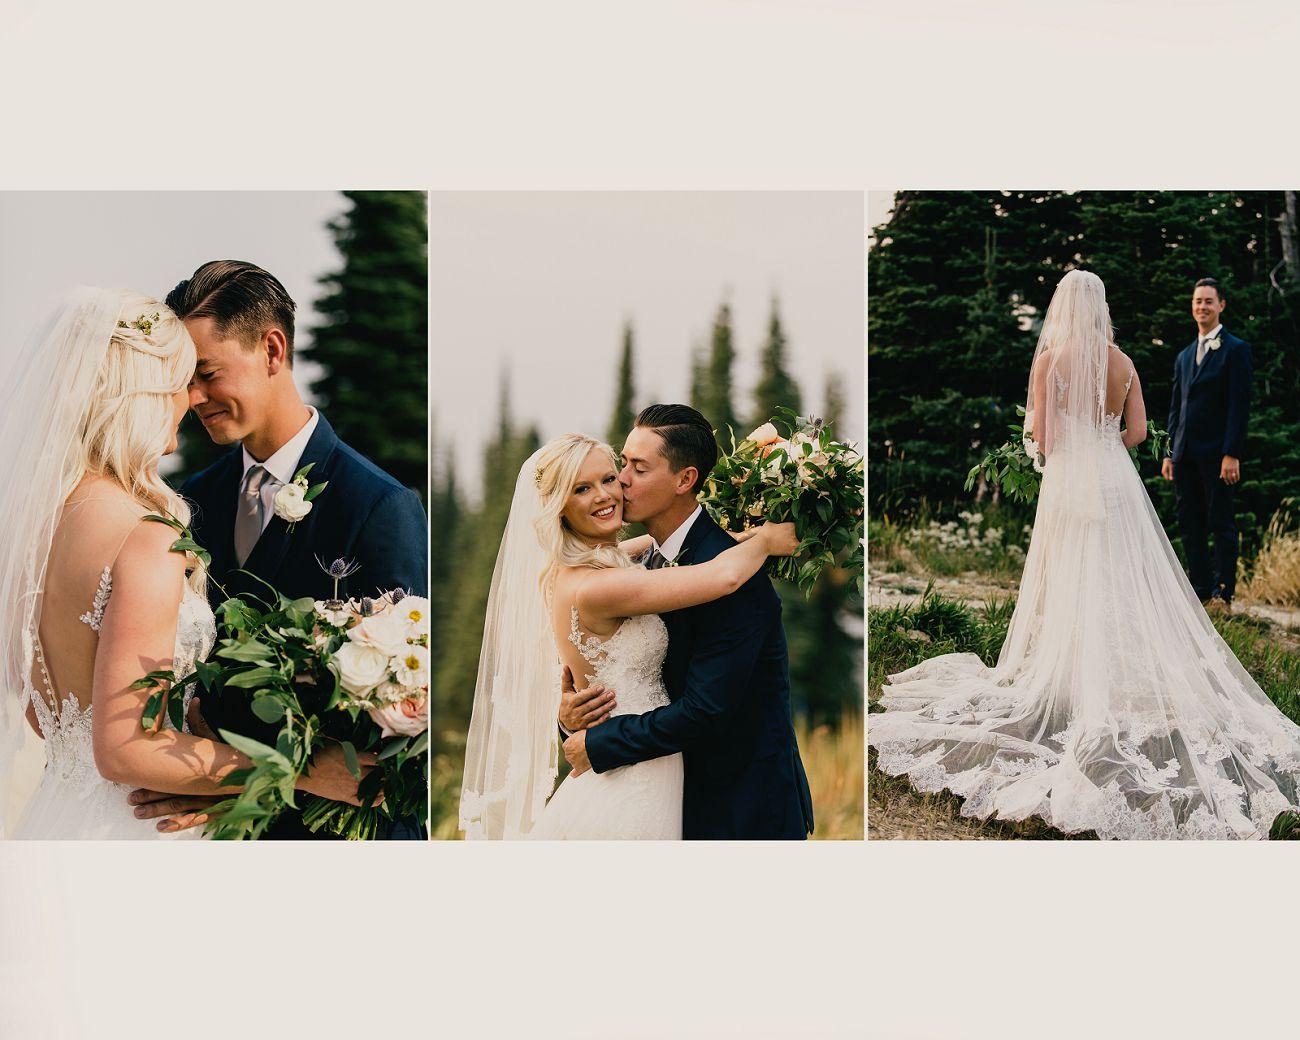 Jennifer_Mooney_Photo_Whitefish_mountain_resort_wedding_elegant_montana_wedding_007.jpg